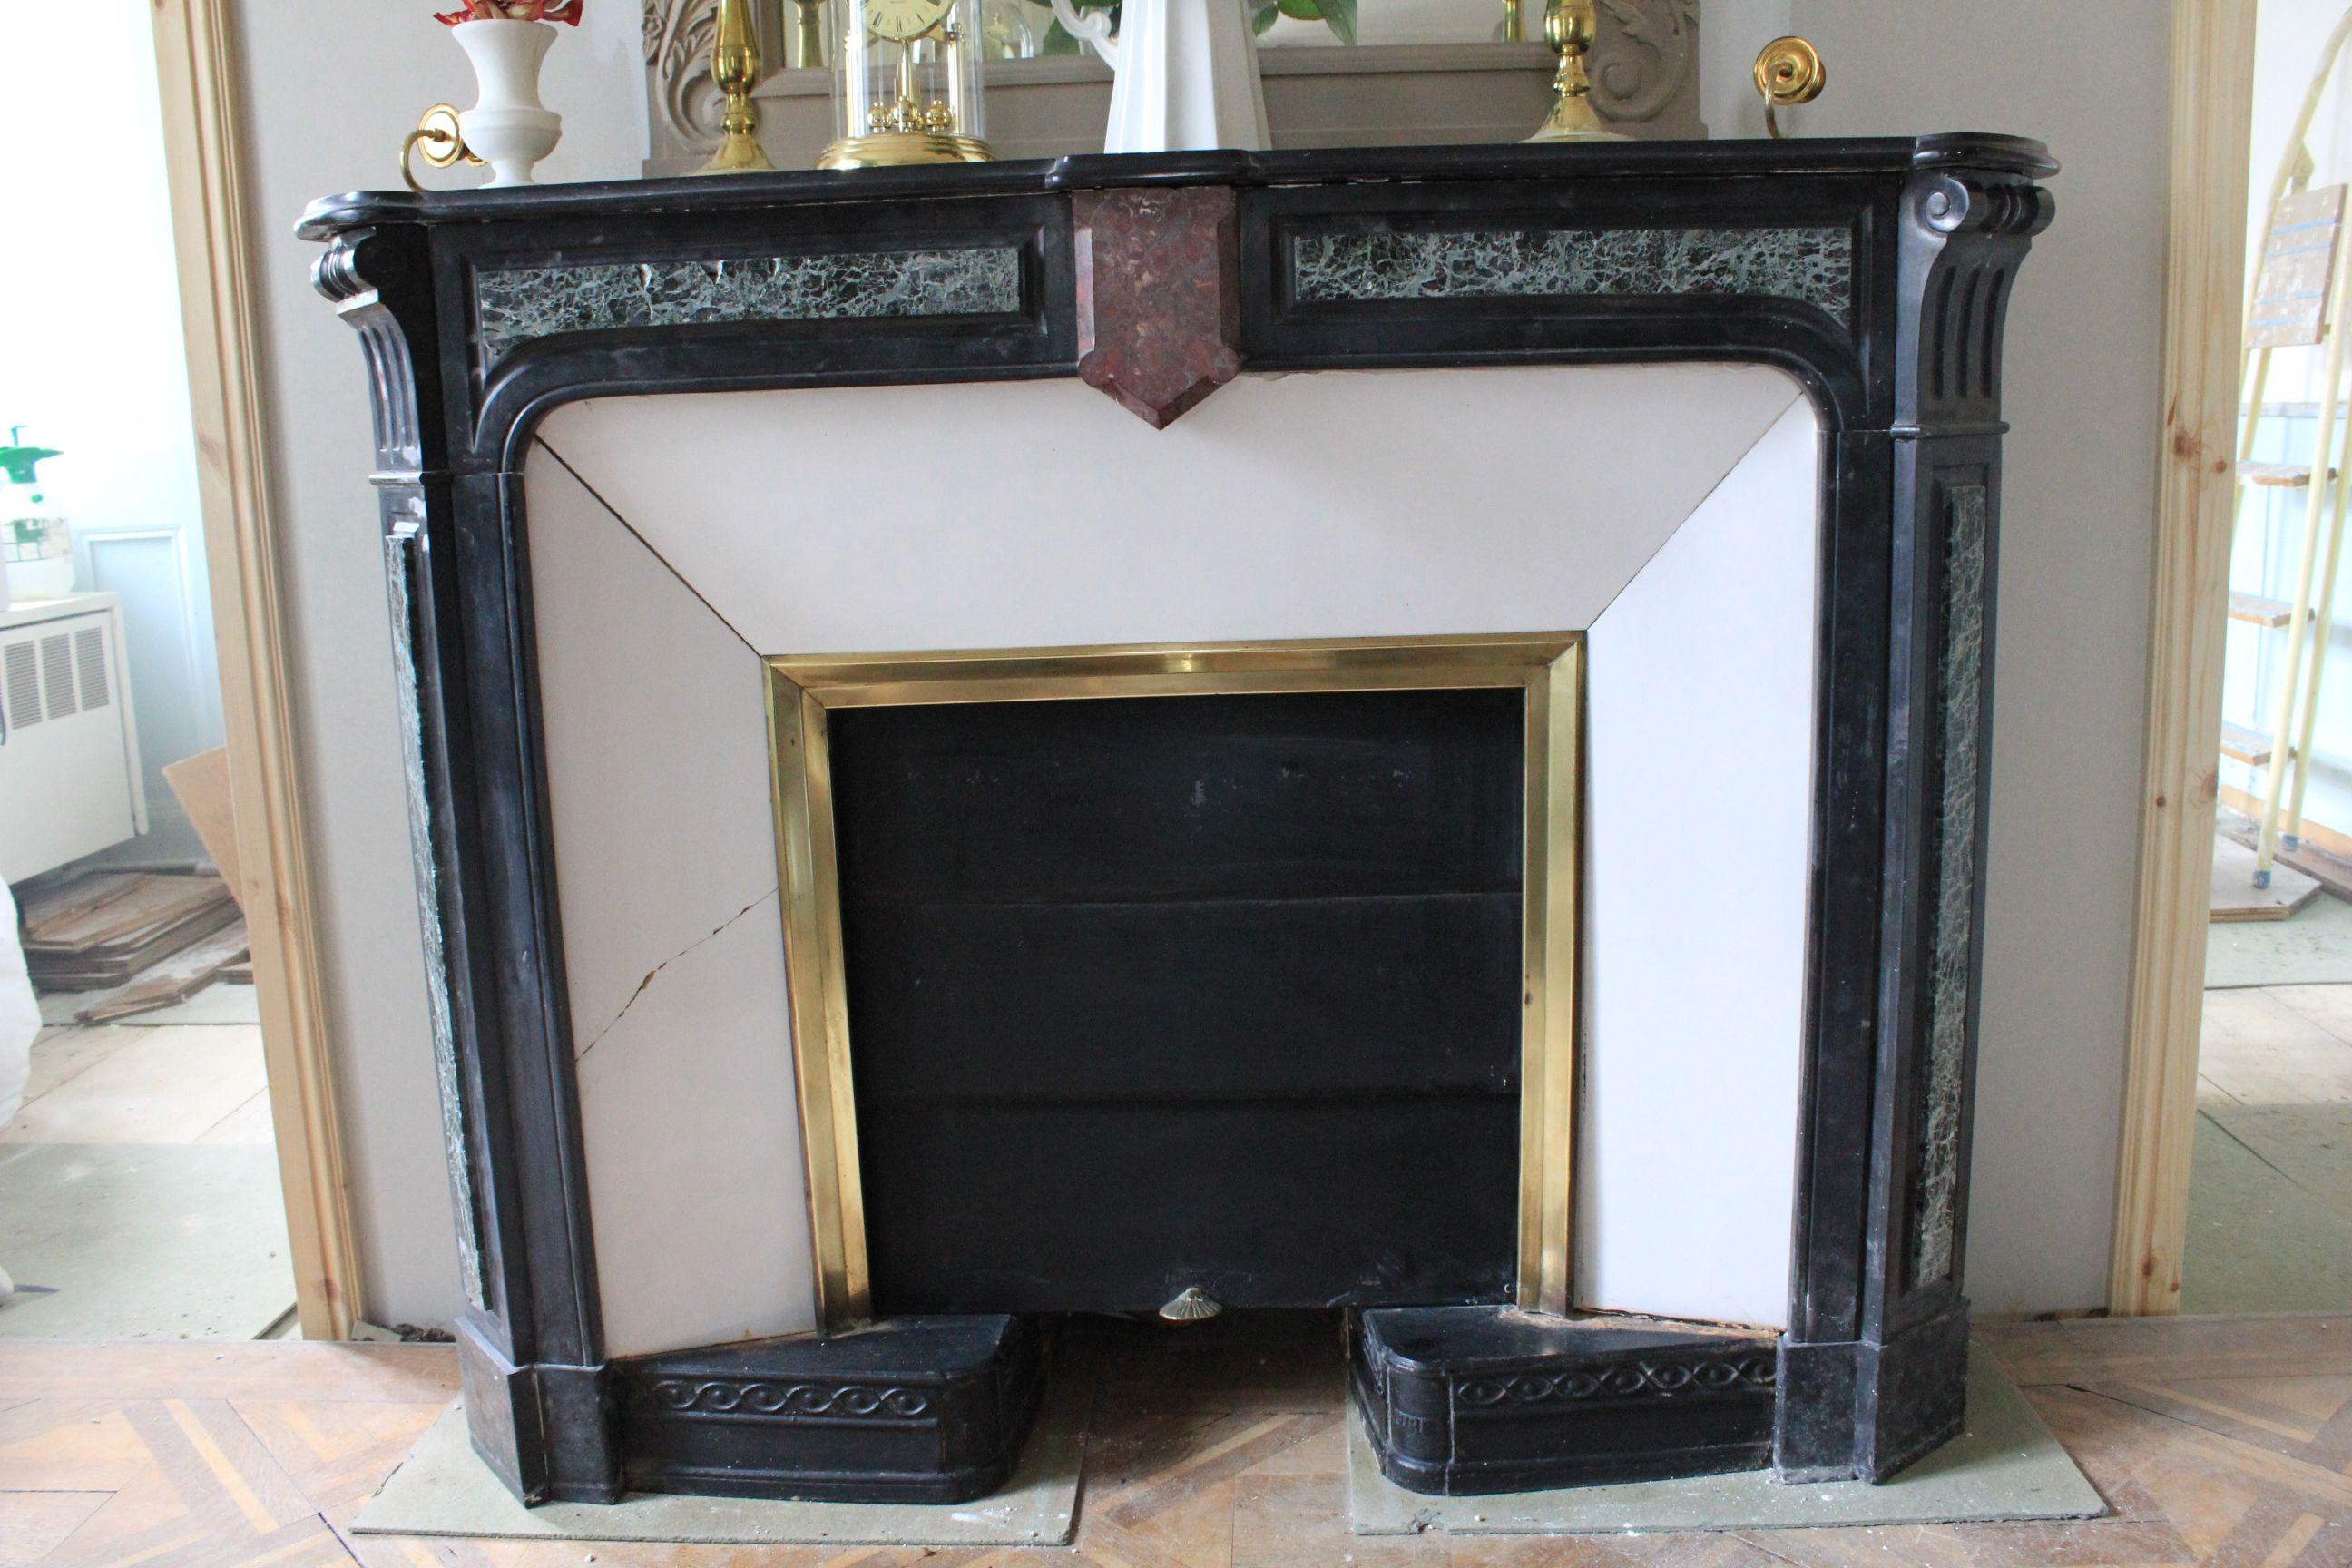 cheminee insert petite taille. Black Bedroom Furniture Sets. Home Design Ideas